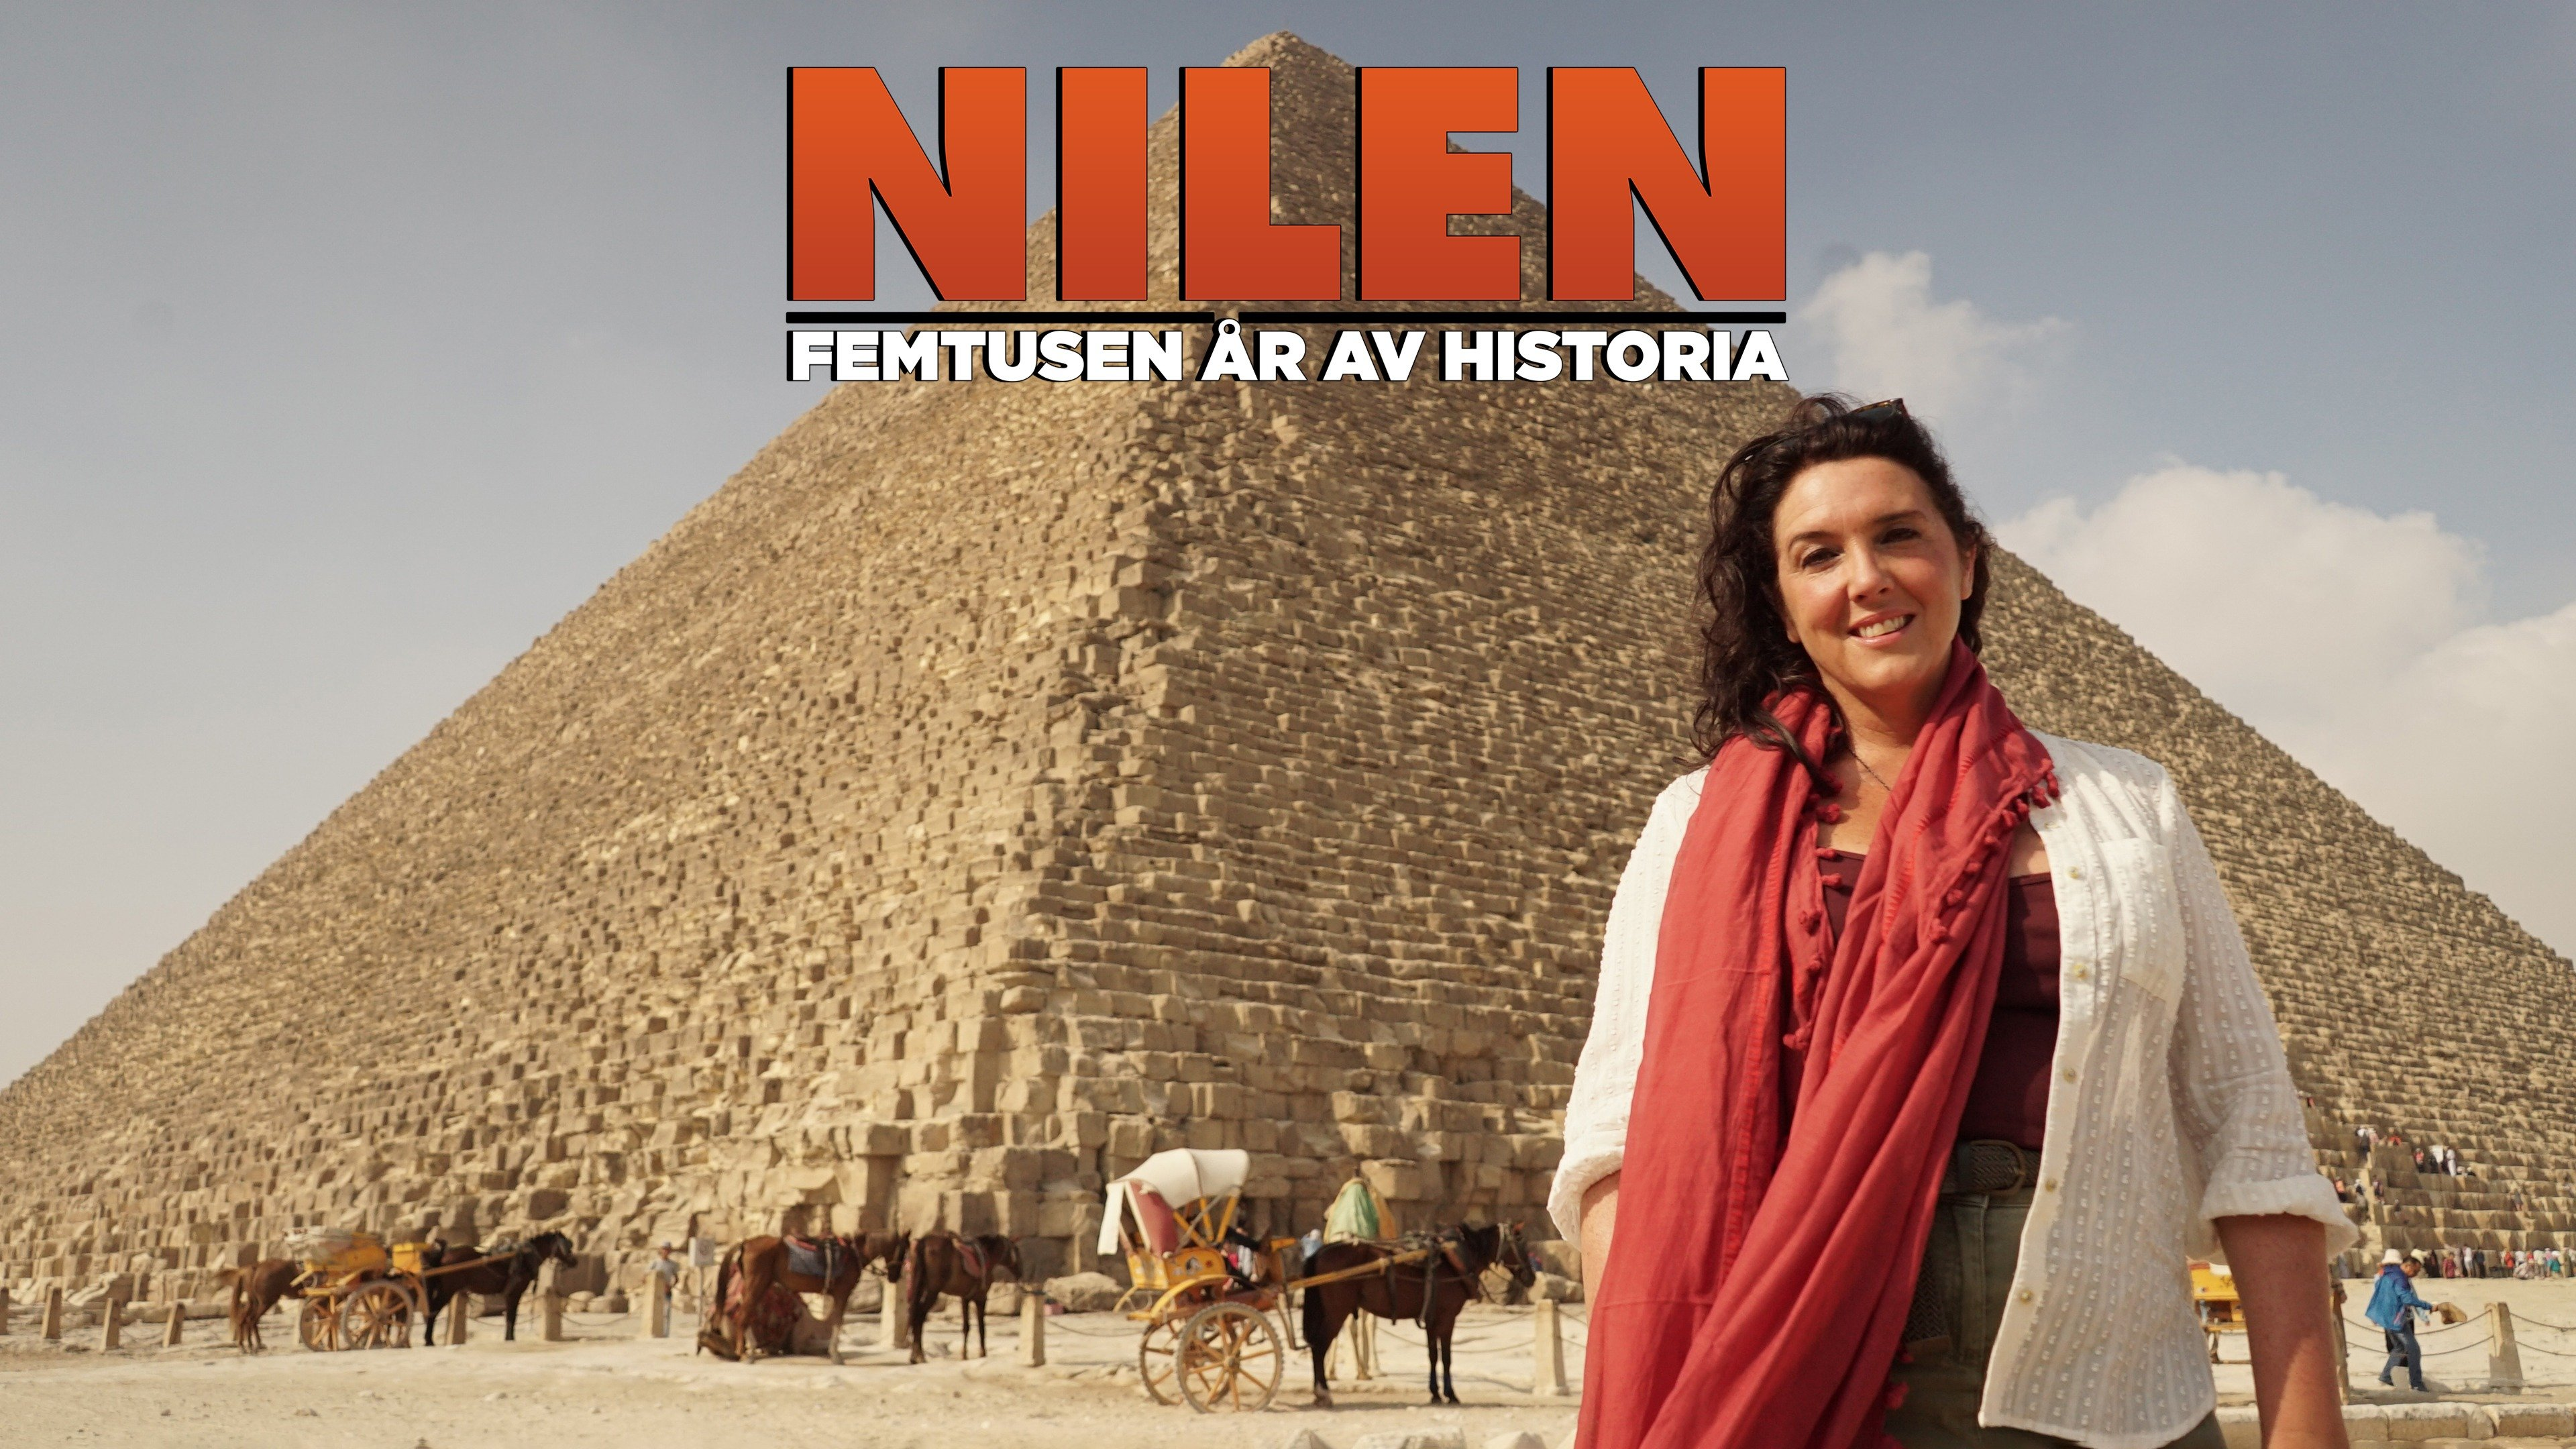 Nilen - Femtusen år av historia